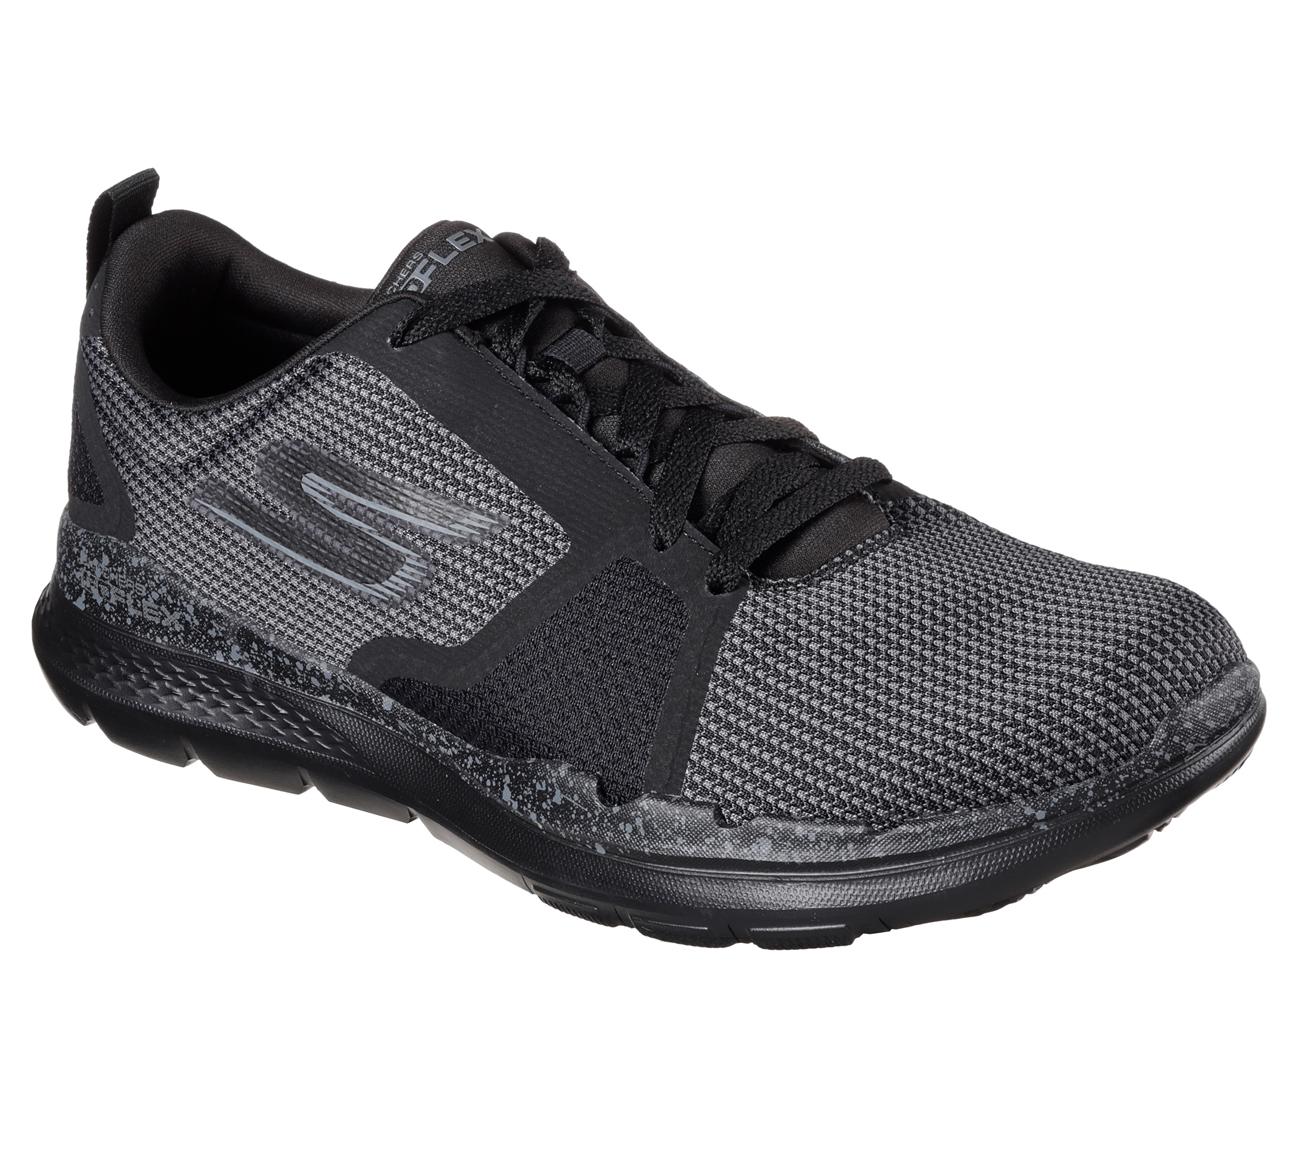 buy skechers skechers go flex train skechers performance shoes only. Black Bedroom Furniture Sets. Home Design Ideas